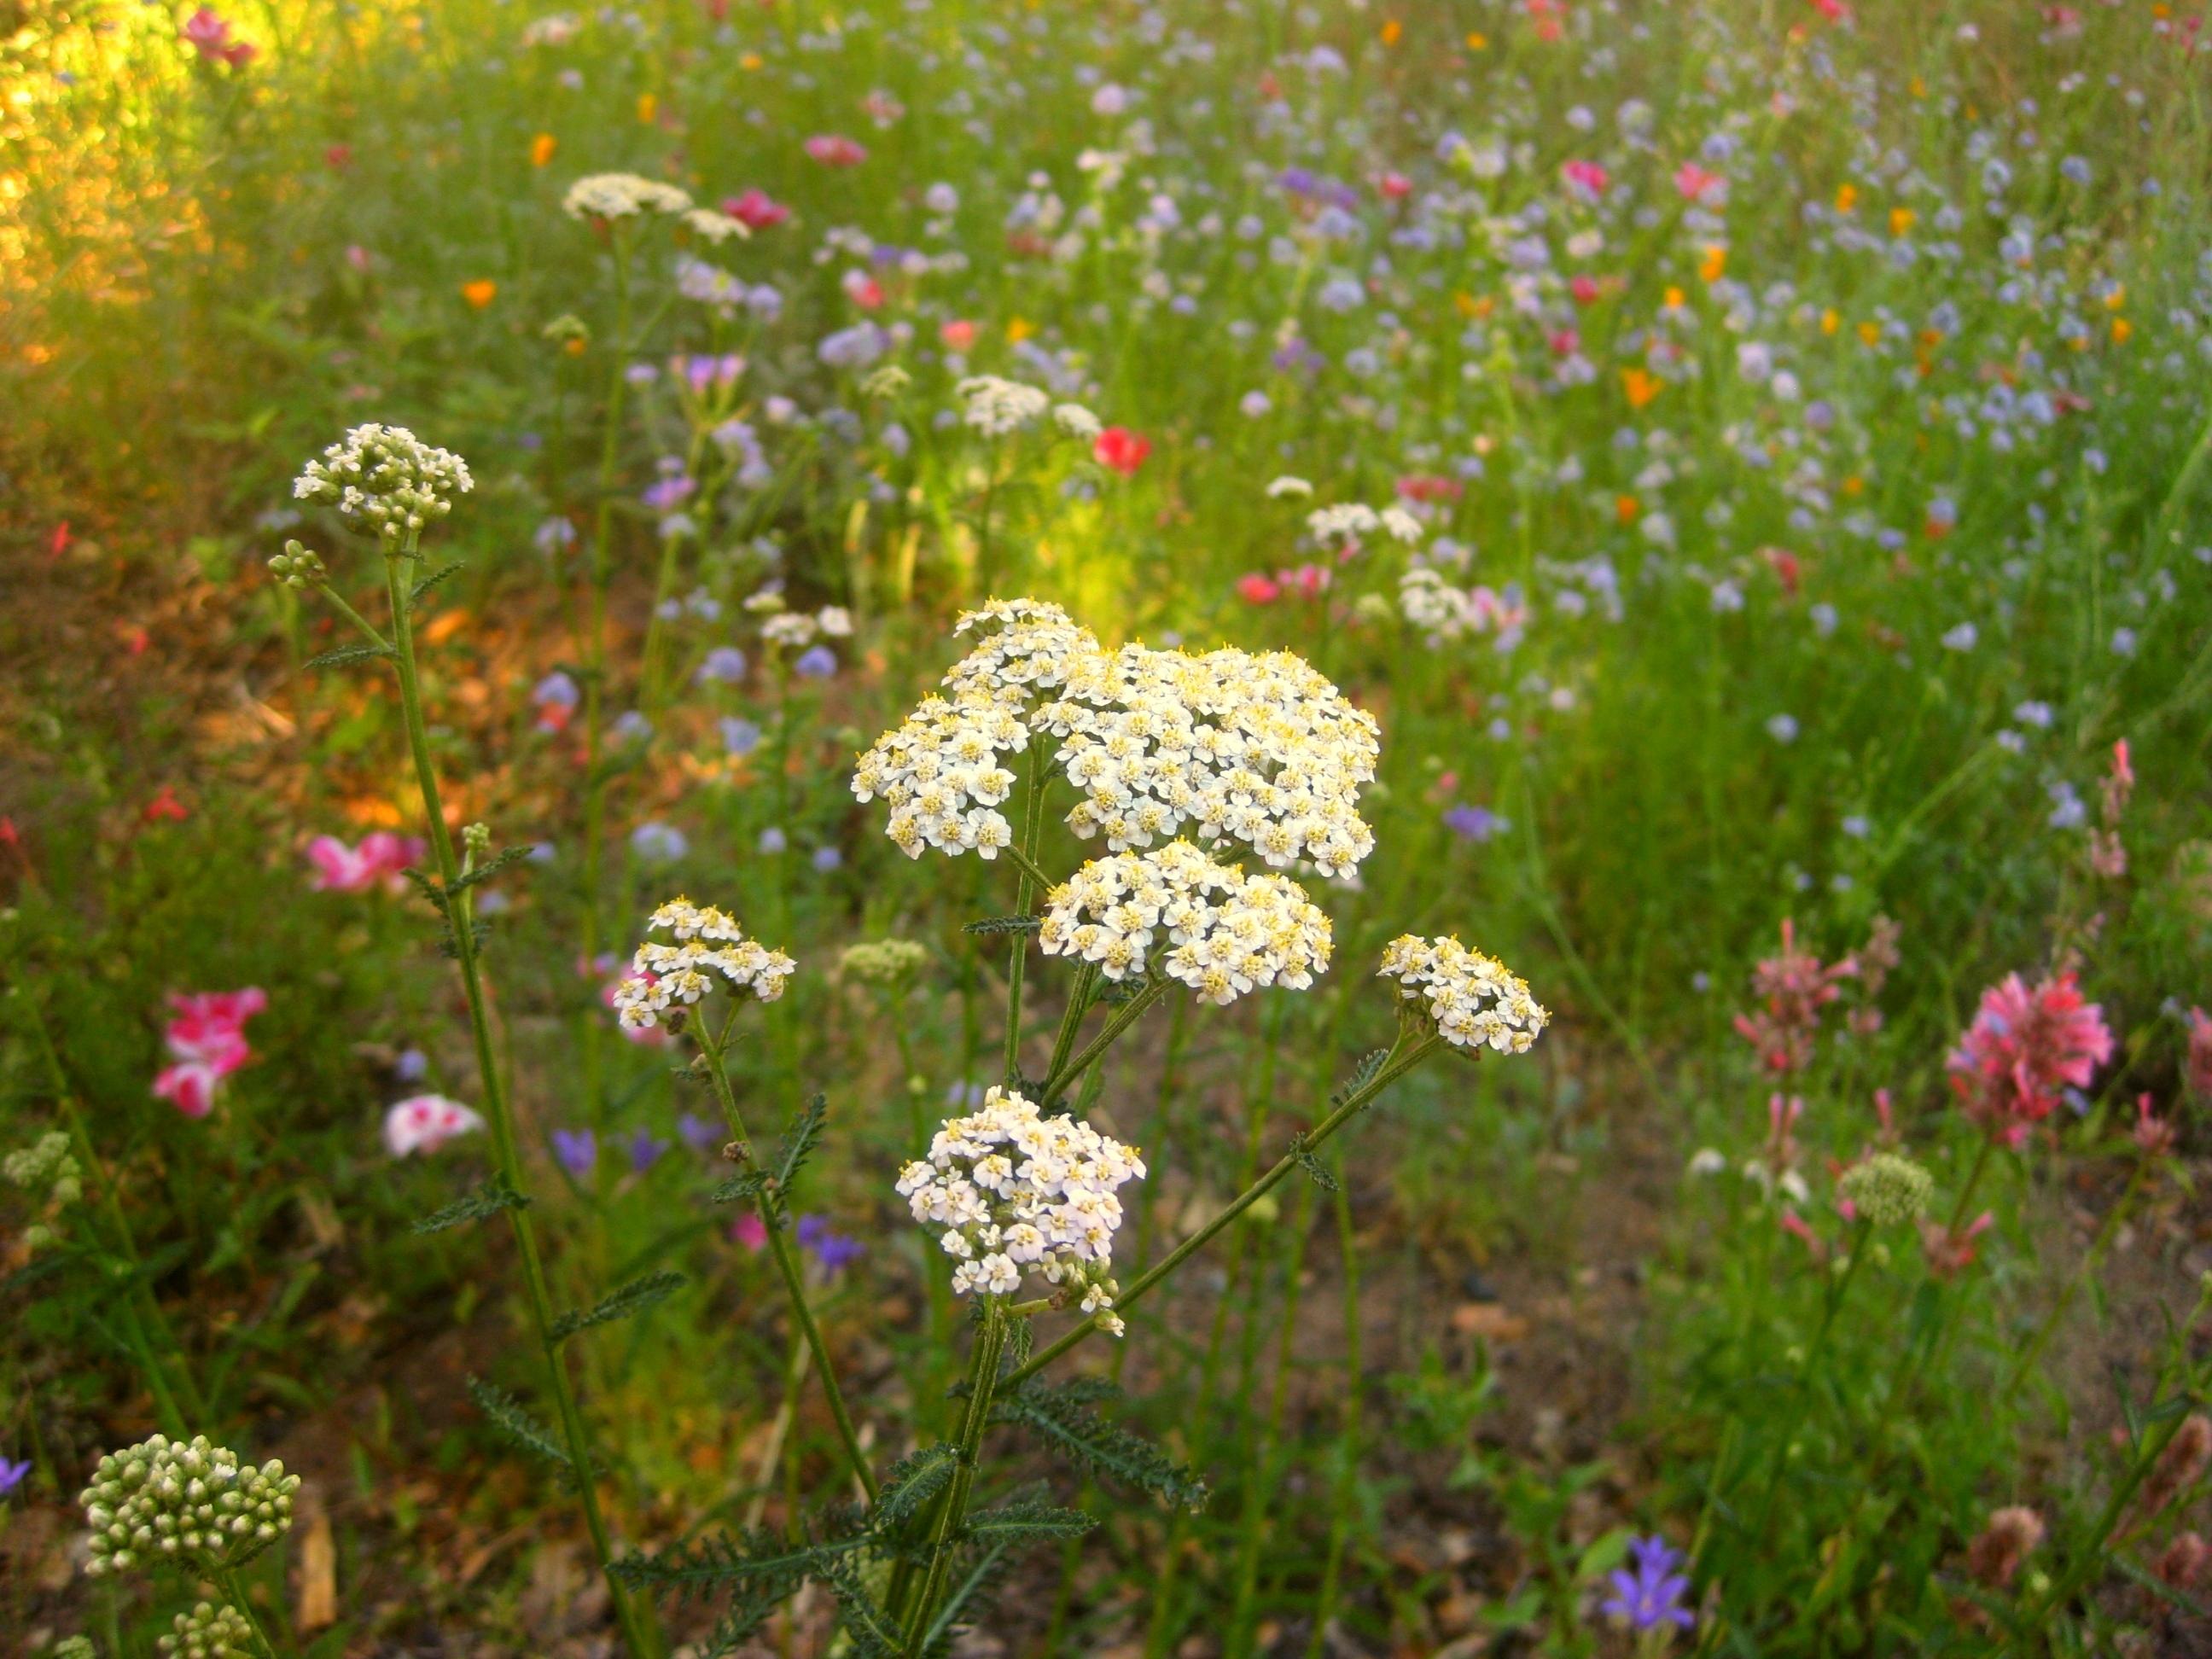 Midsummer meadow